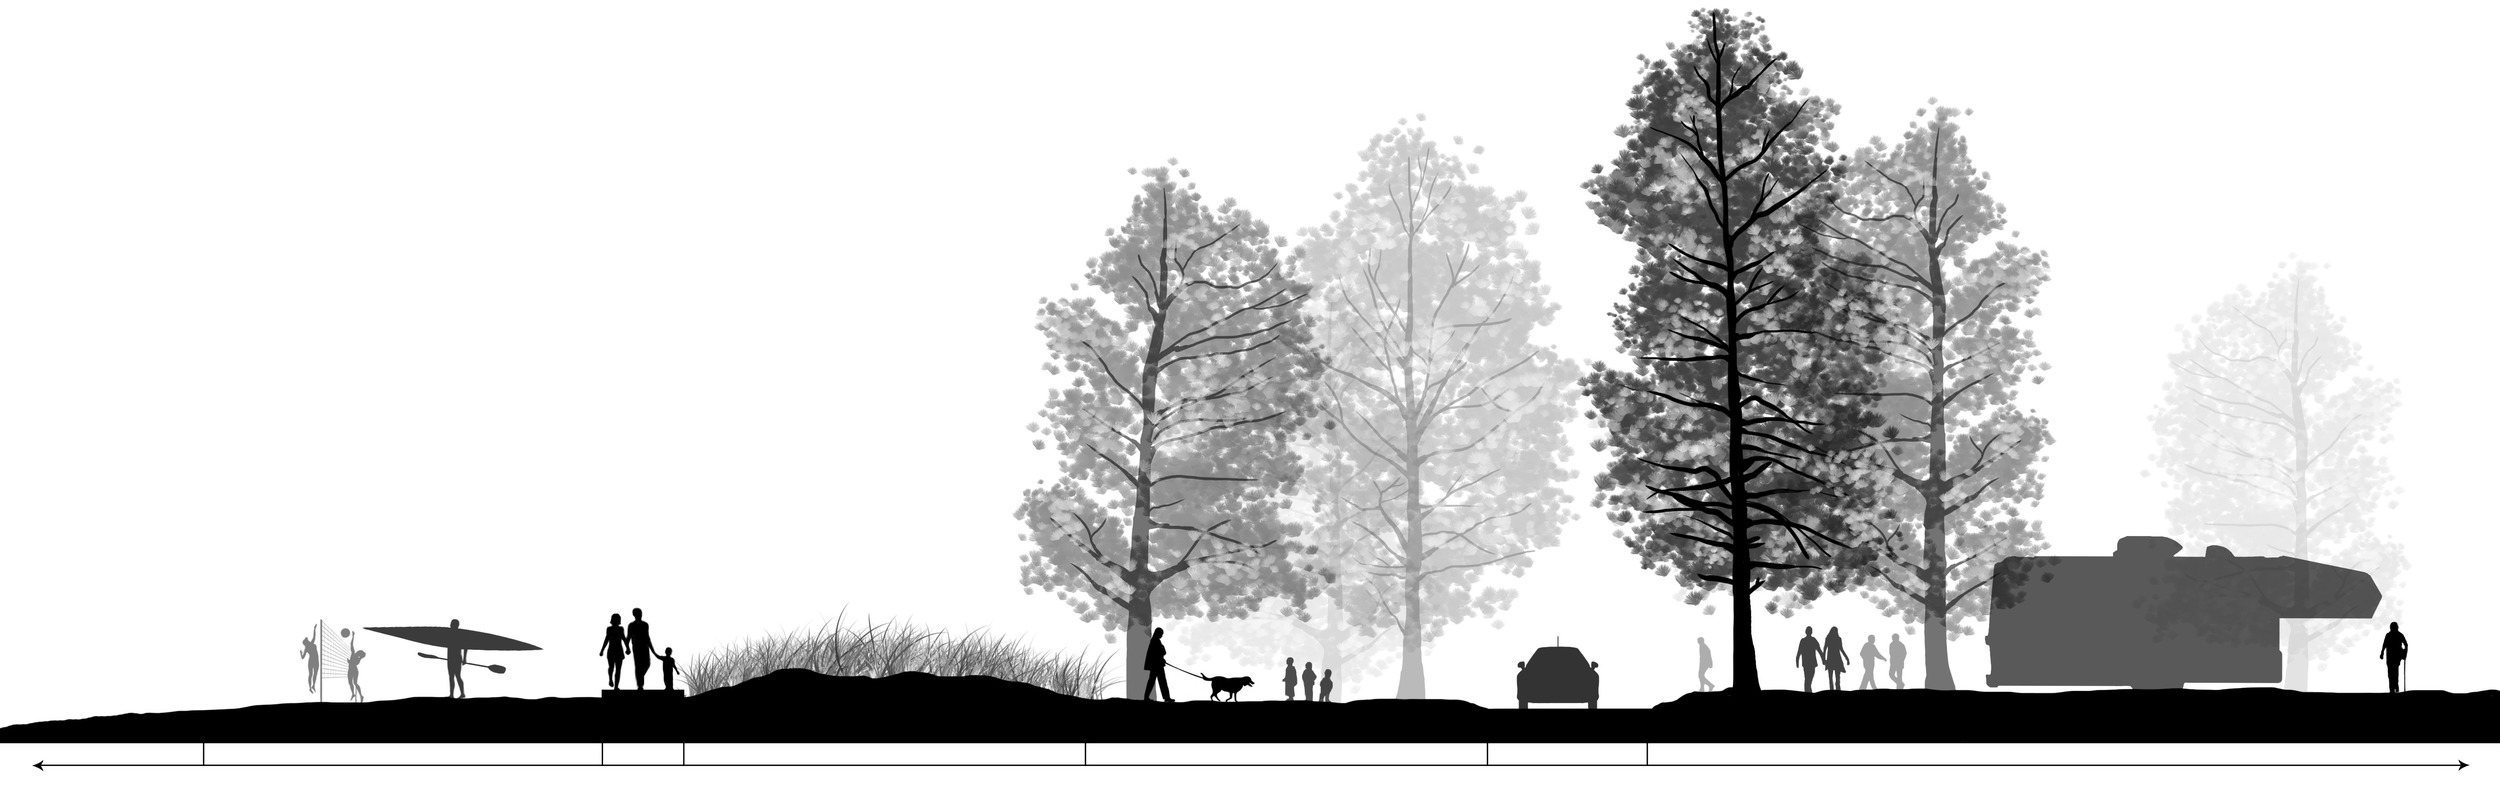 Ojibway Park Master Plan , Sault Ste. Marie, Ontario